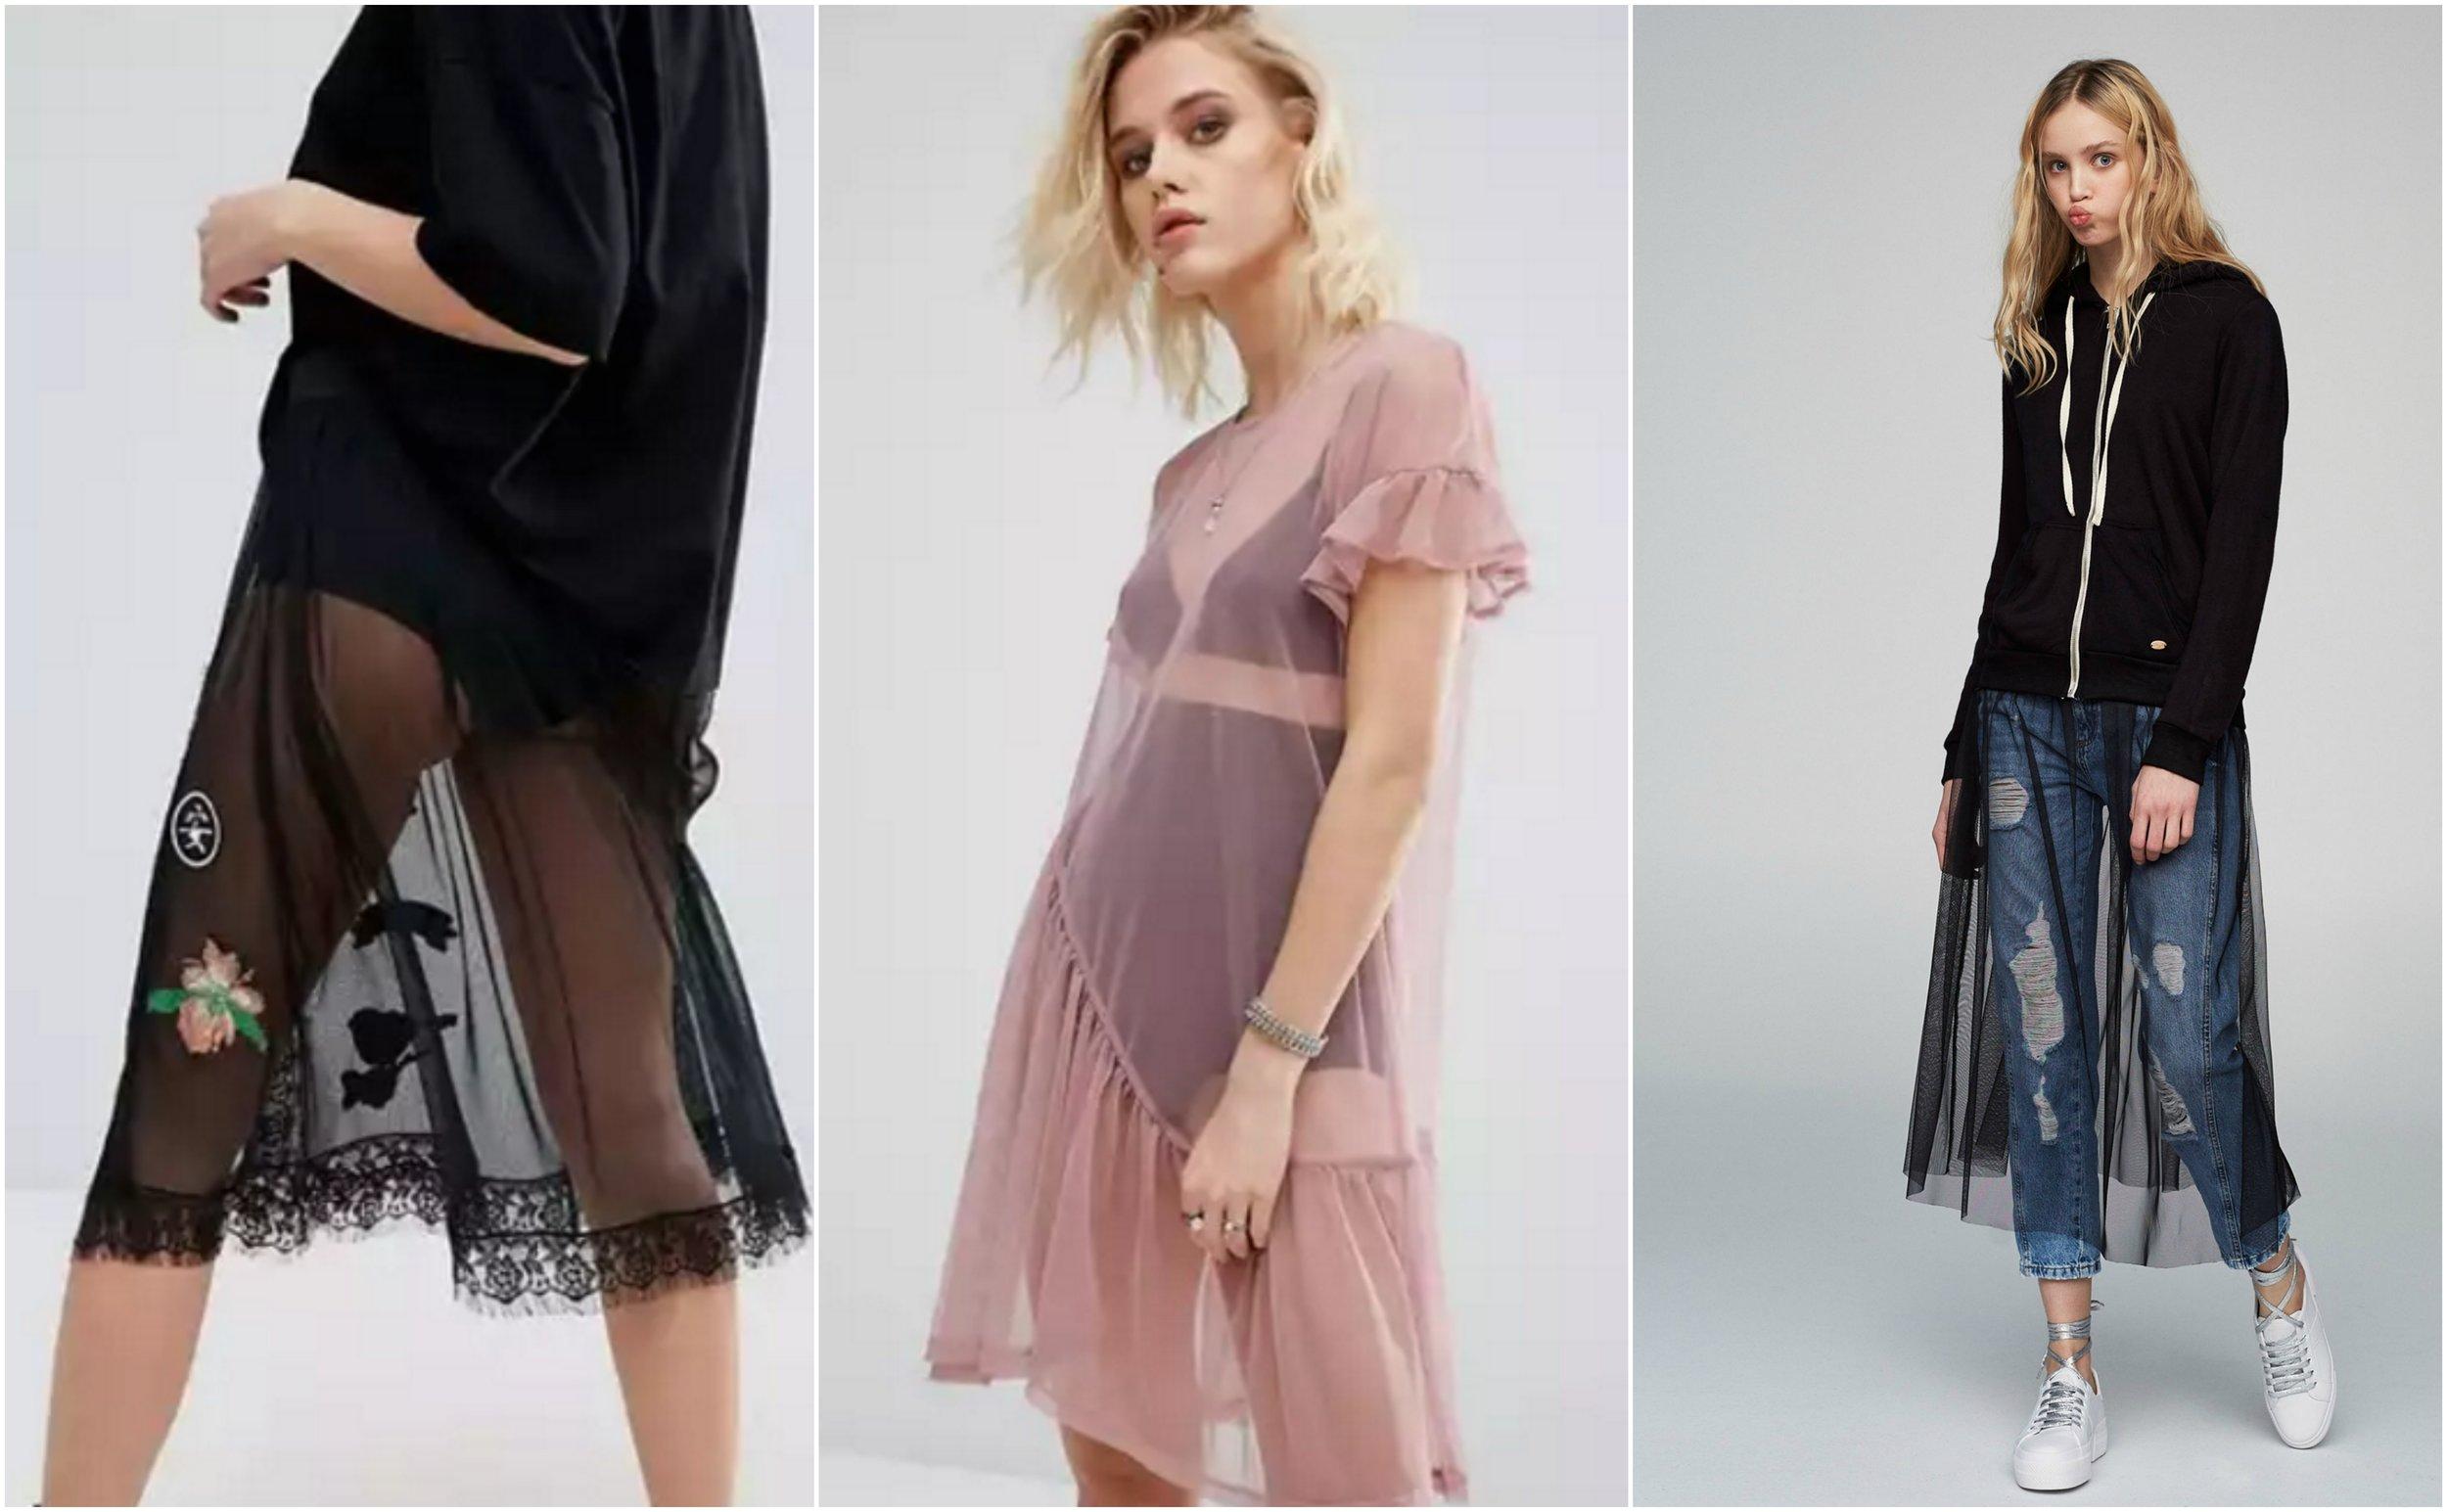 annaporter-spring-trends-transparent-skirt-dress